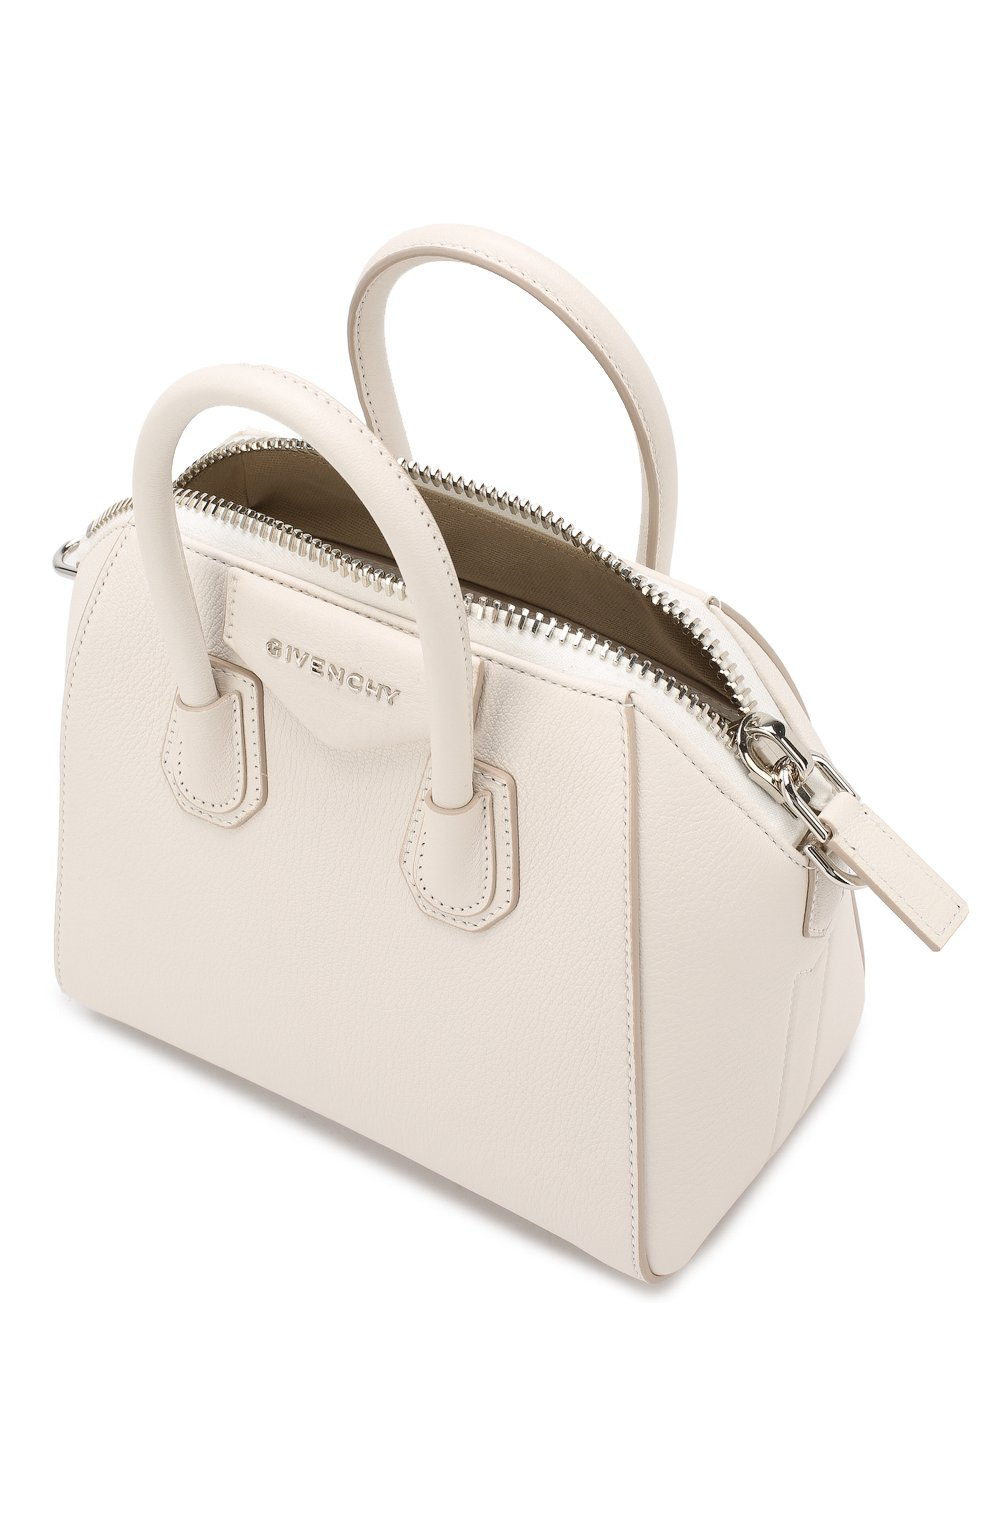 Сумка Antigona mini Givenchy белая цвета | Фото №4